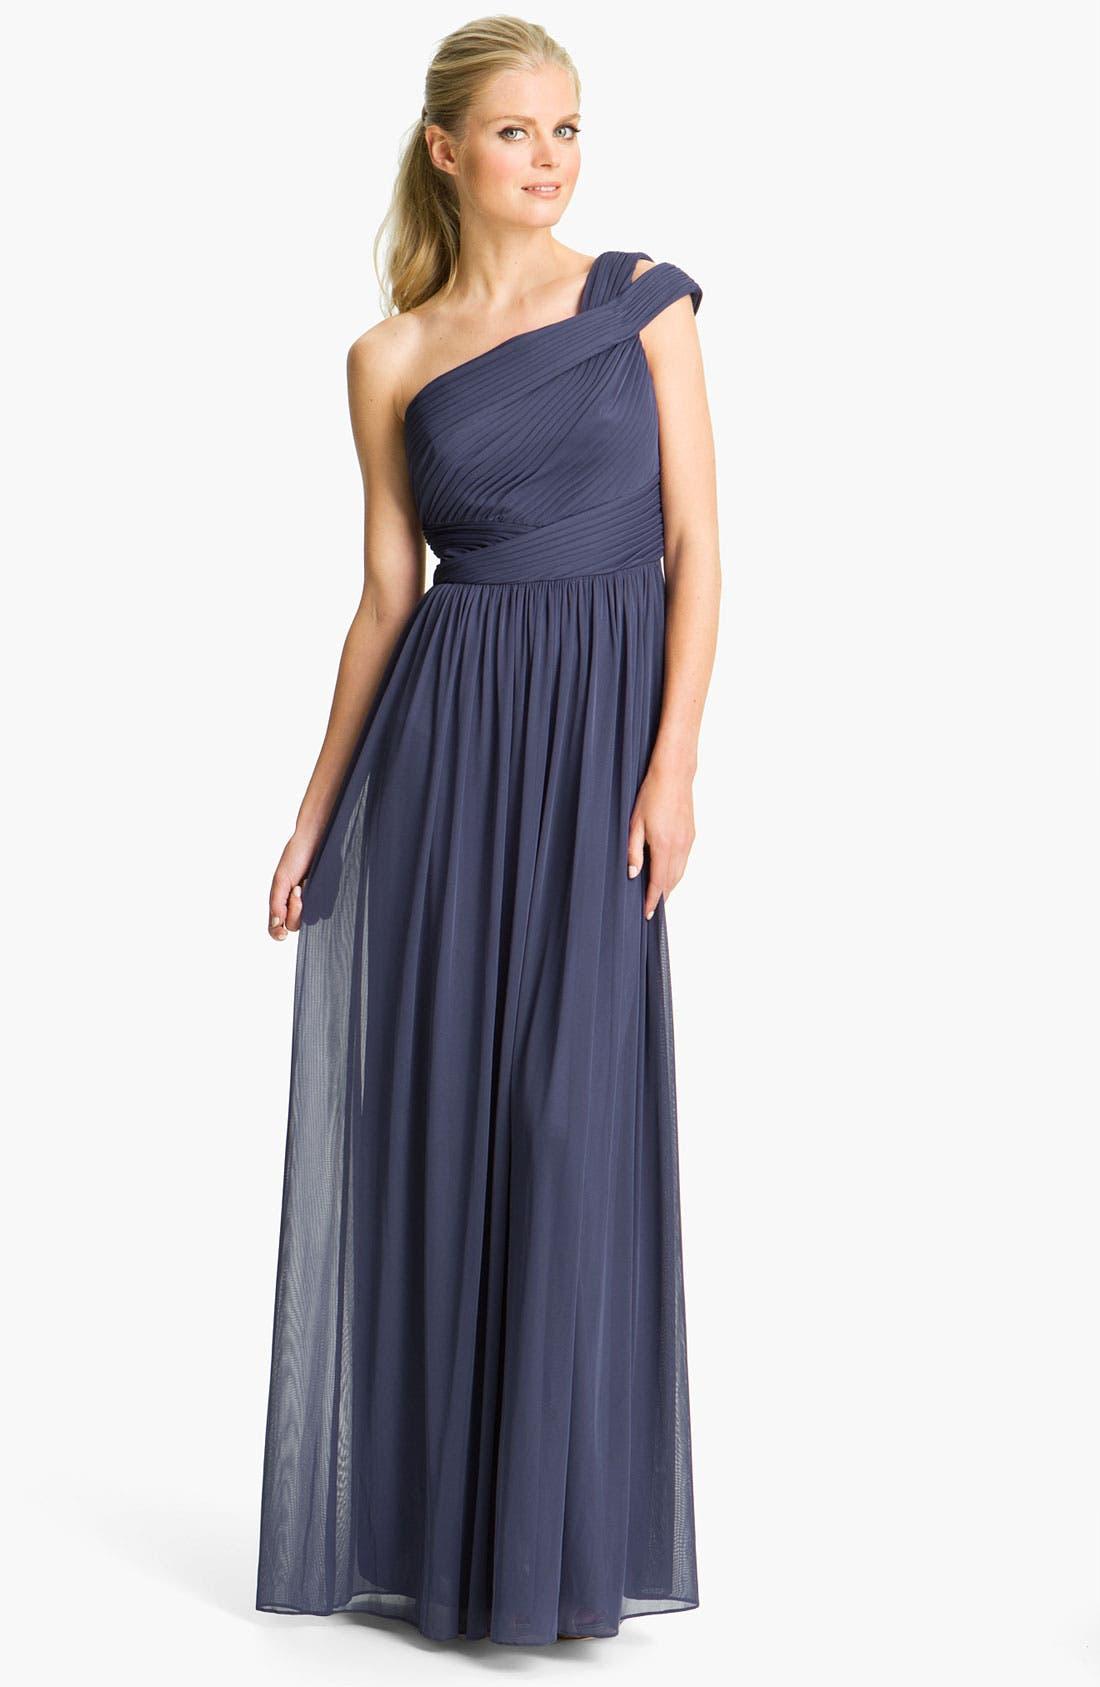 Alternate Image 1 Selected - ML Monique Lhuillier Bridesmaids Cutout One-Shoulder Mesh Gown (Nordstrom Exclusive)